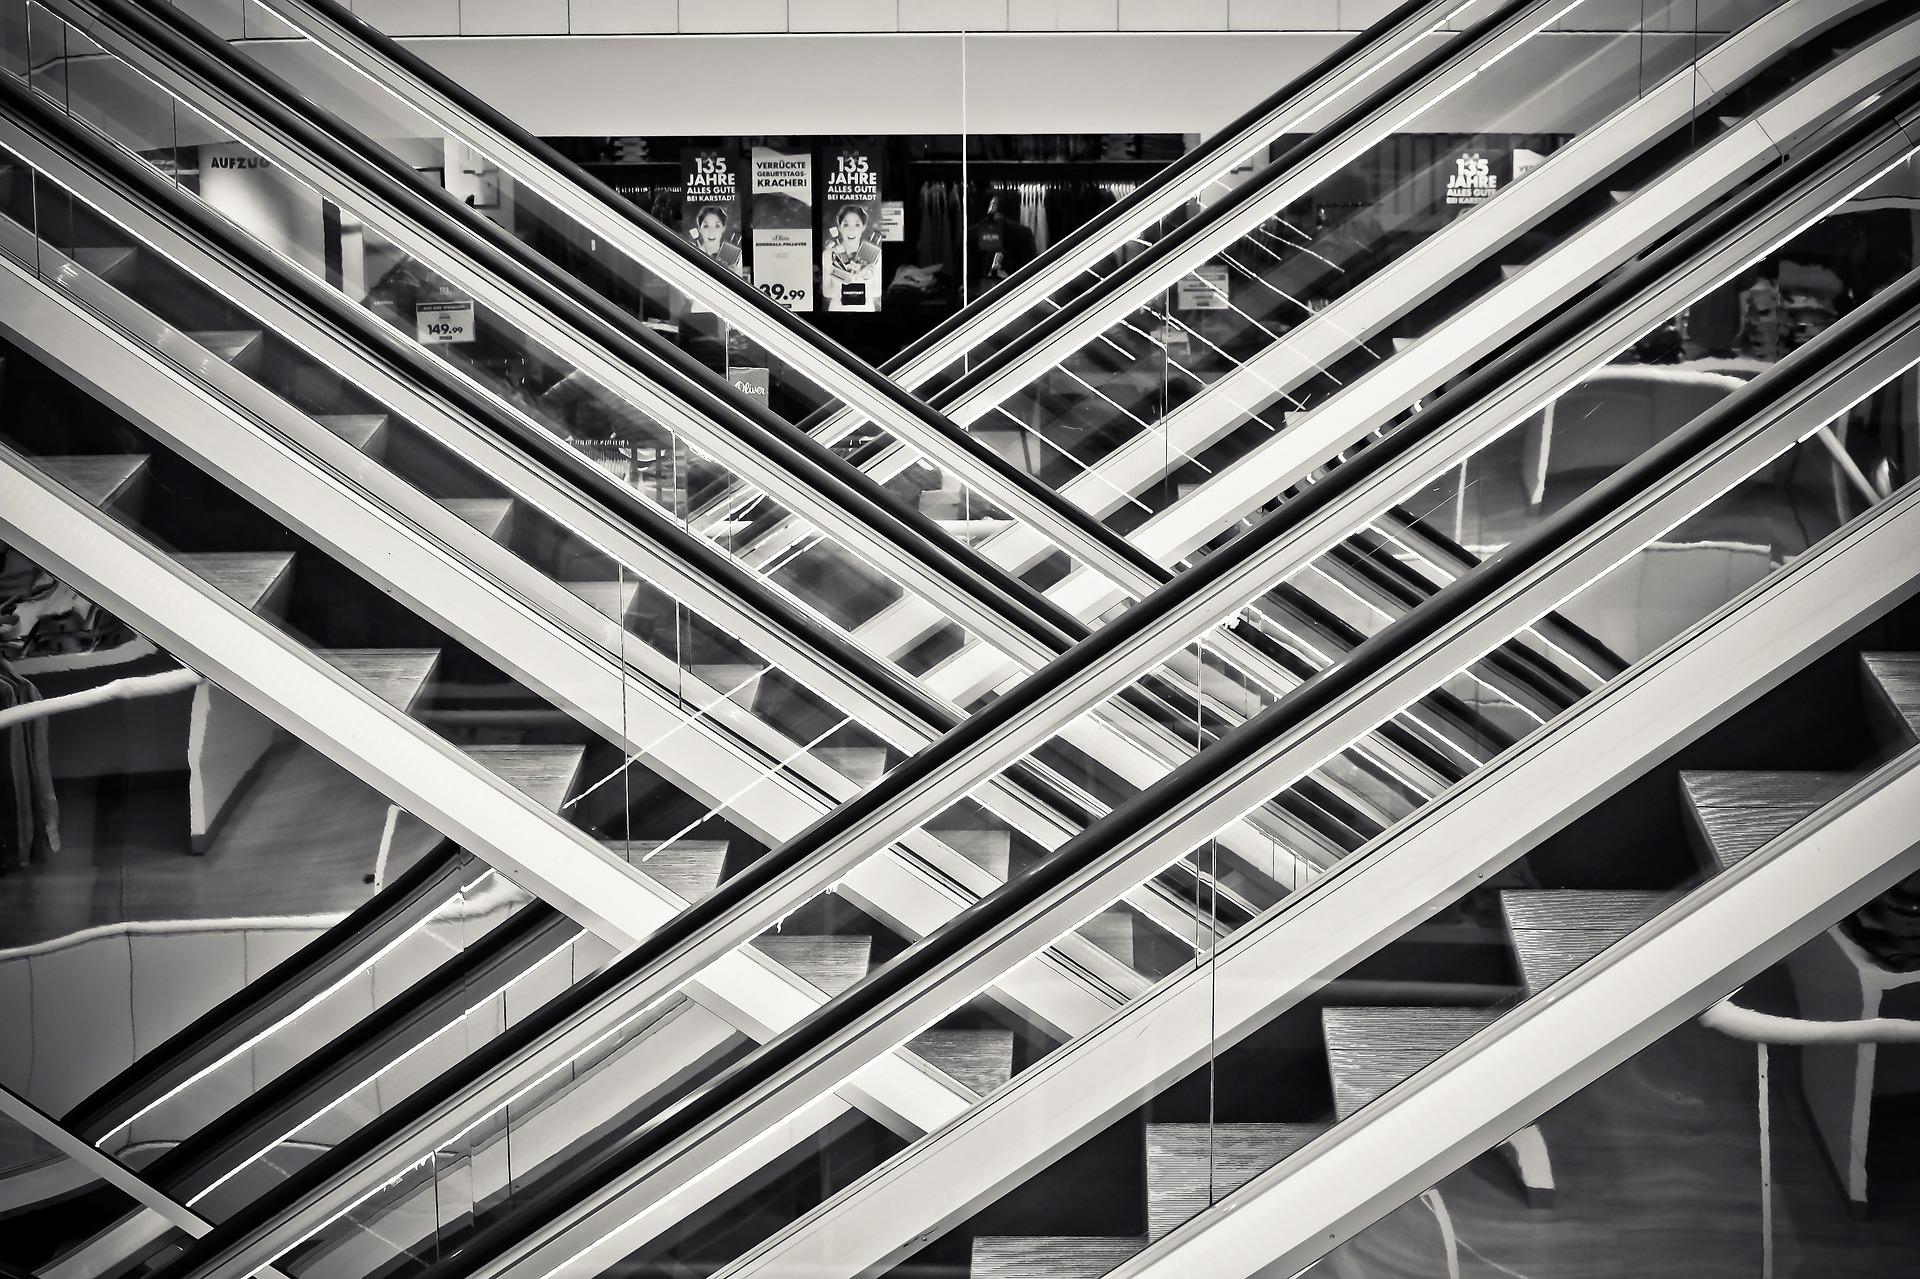 department-store-1778722_1920